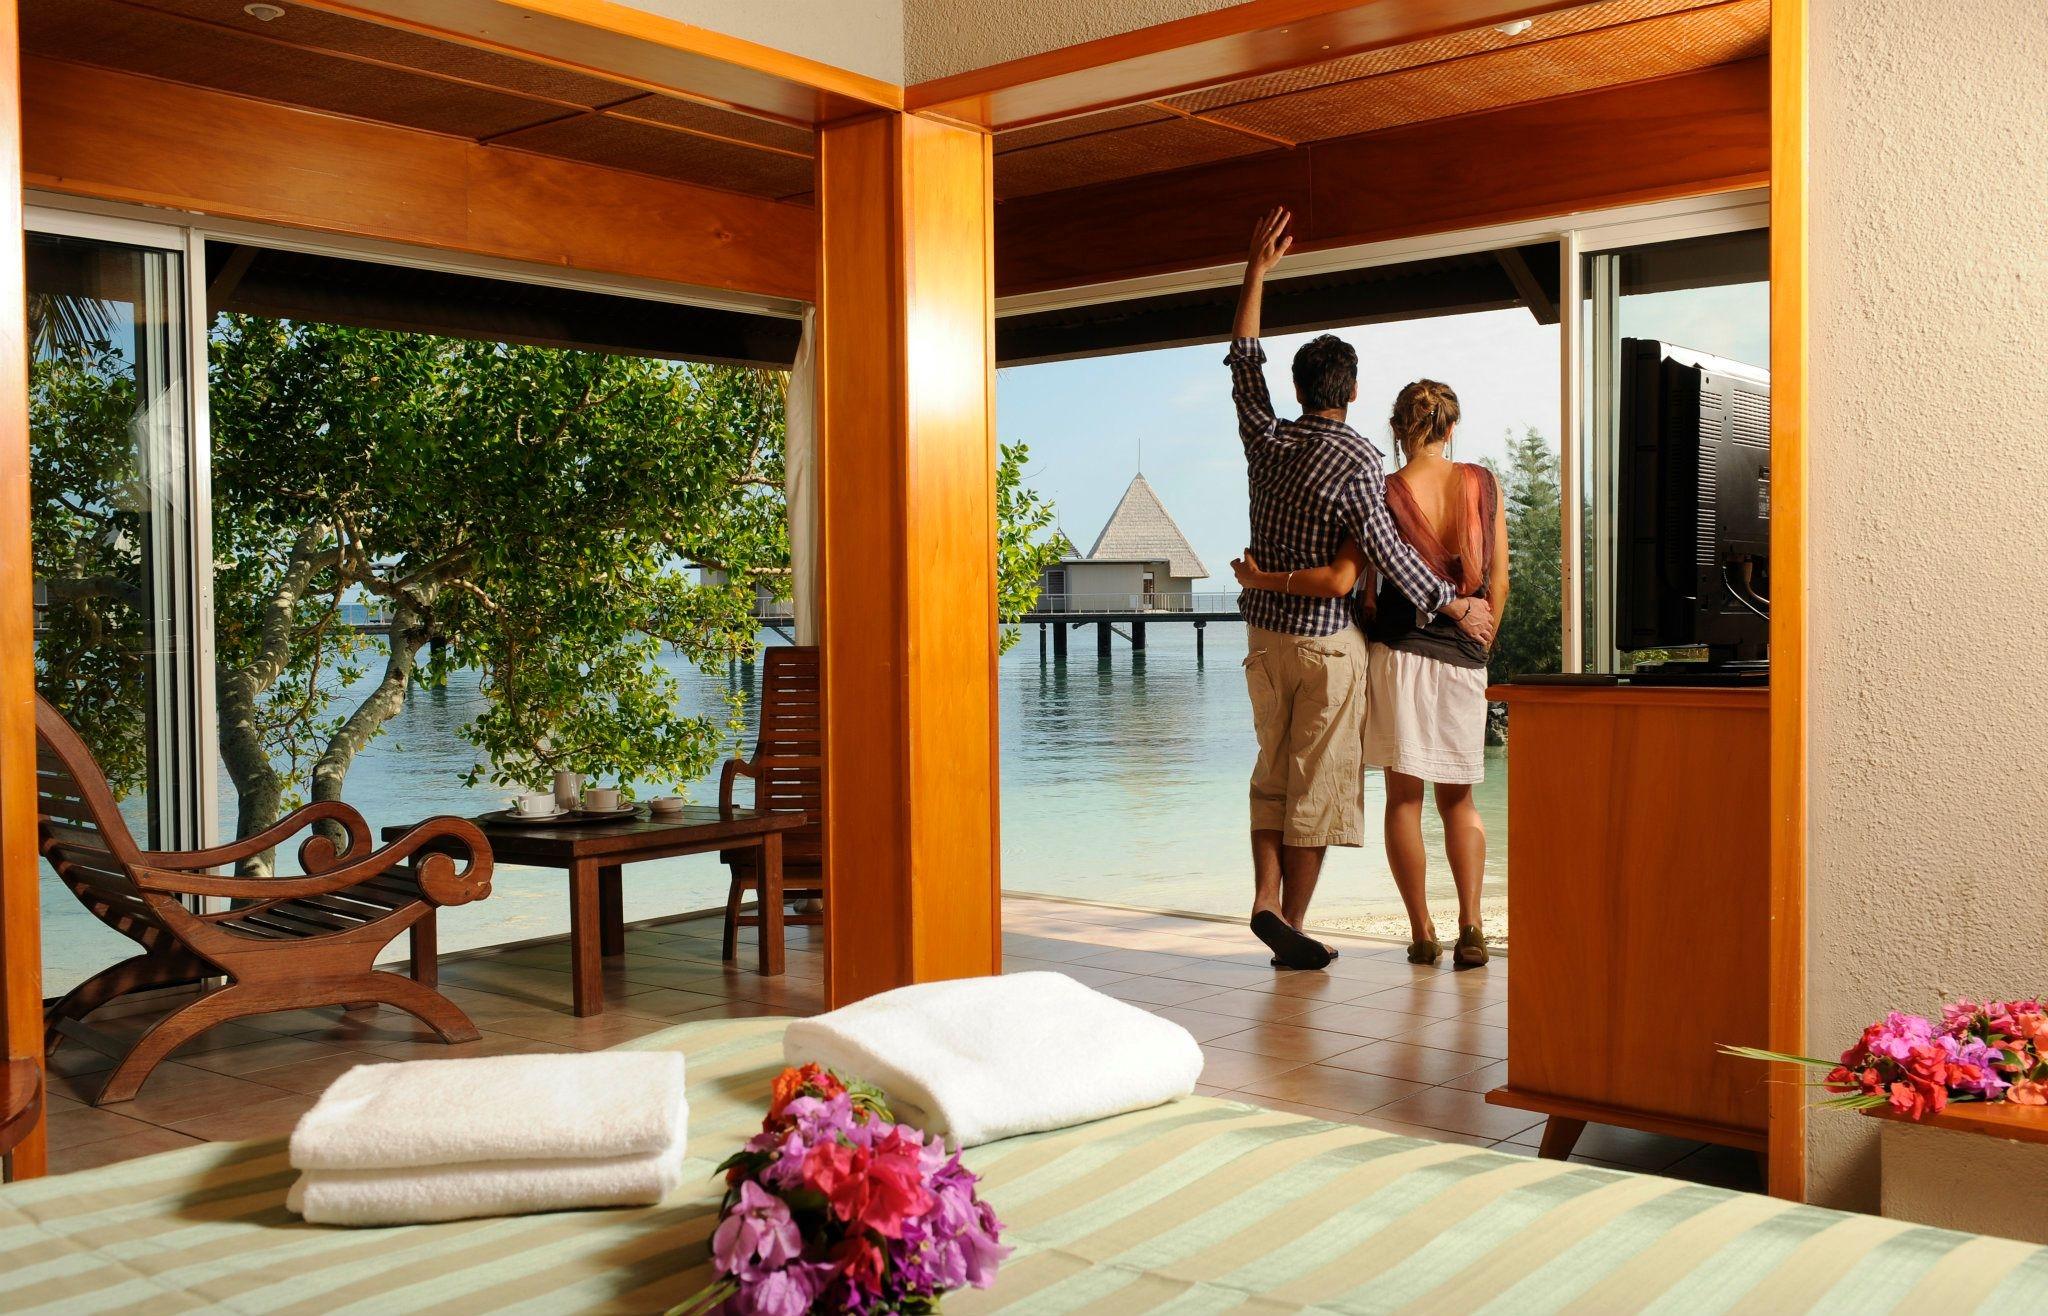 Escapade Island beach bungalow